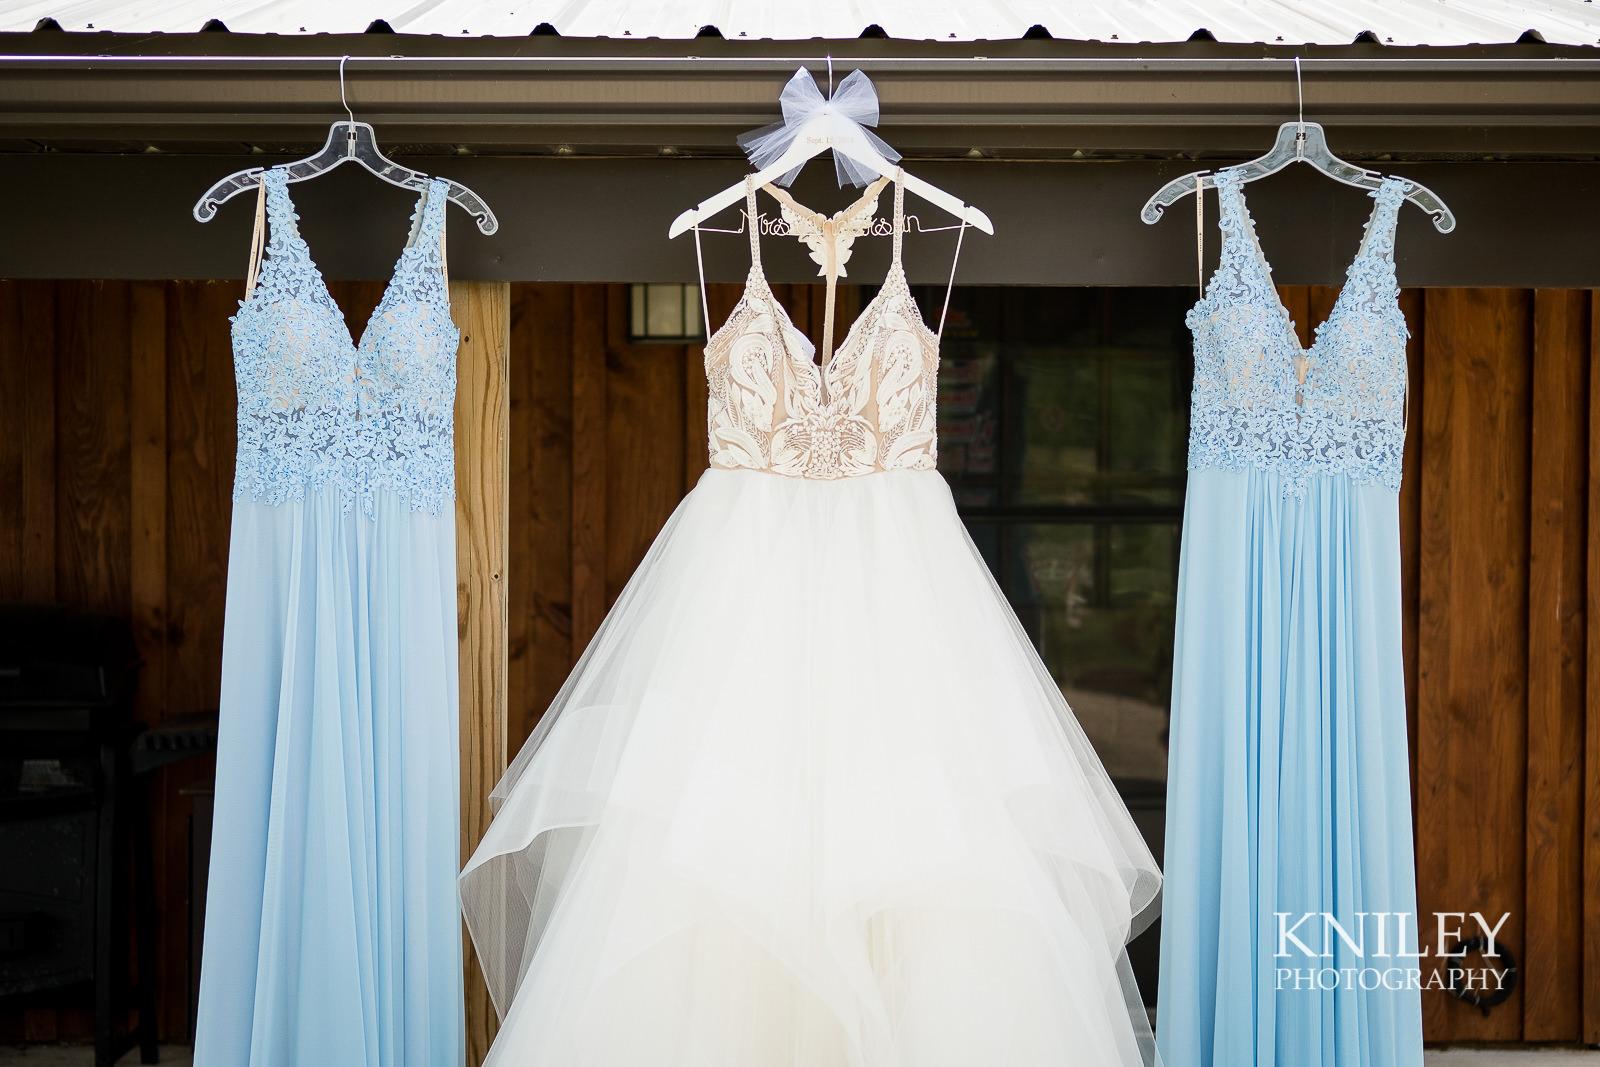 019 - Buffalo NY wedding - Preparation pictures - XT2B8232.jpg